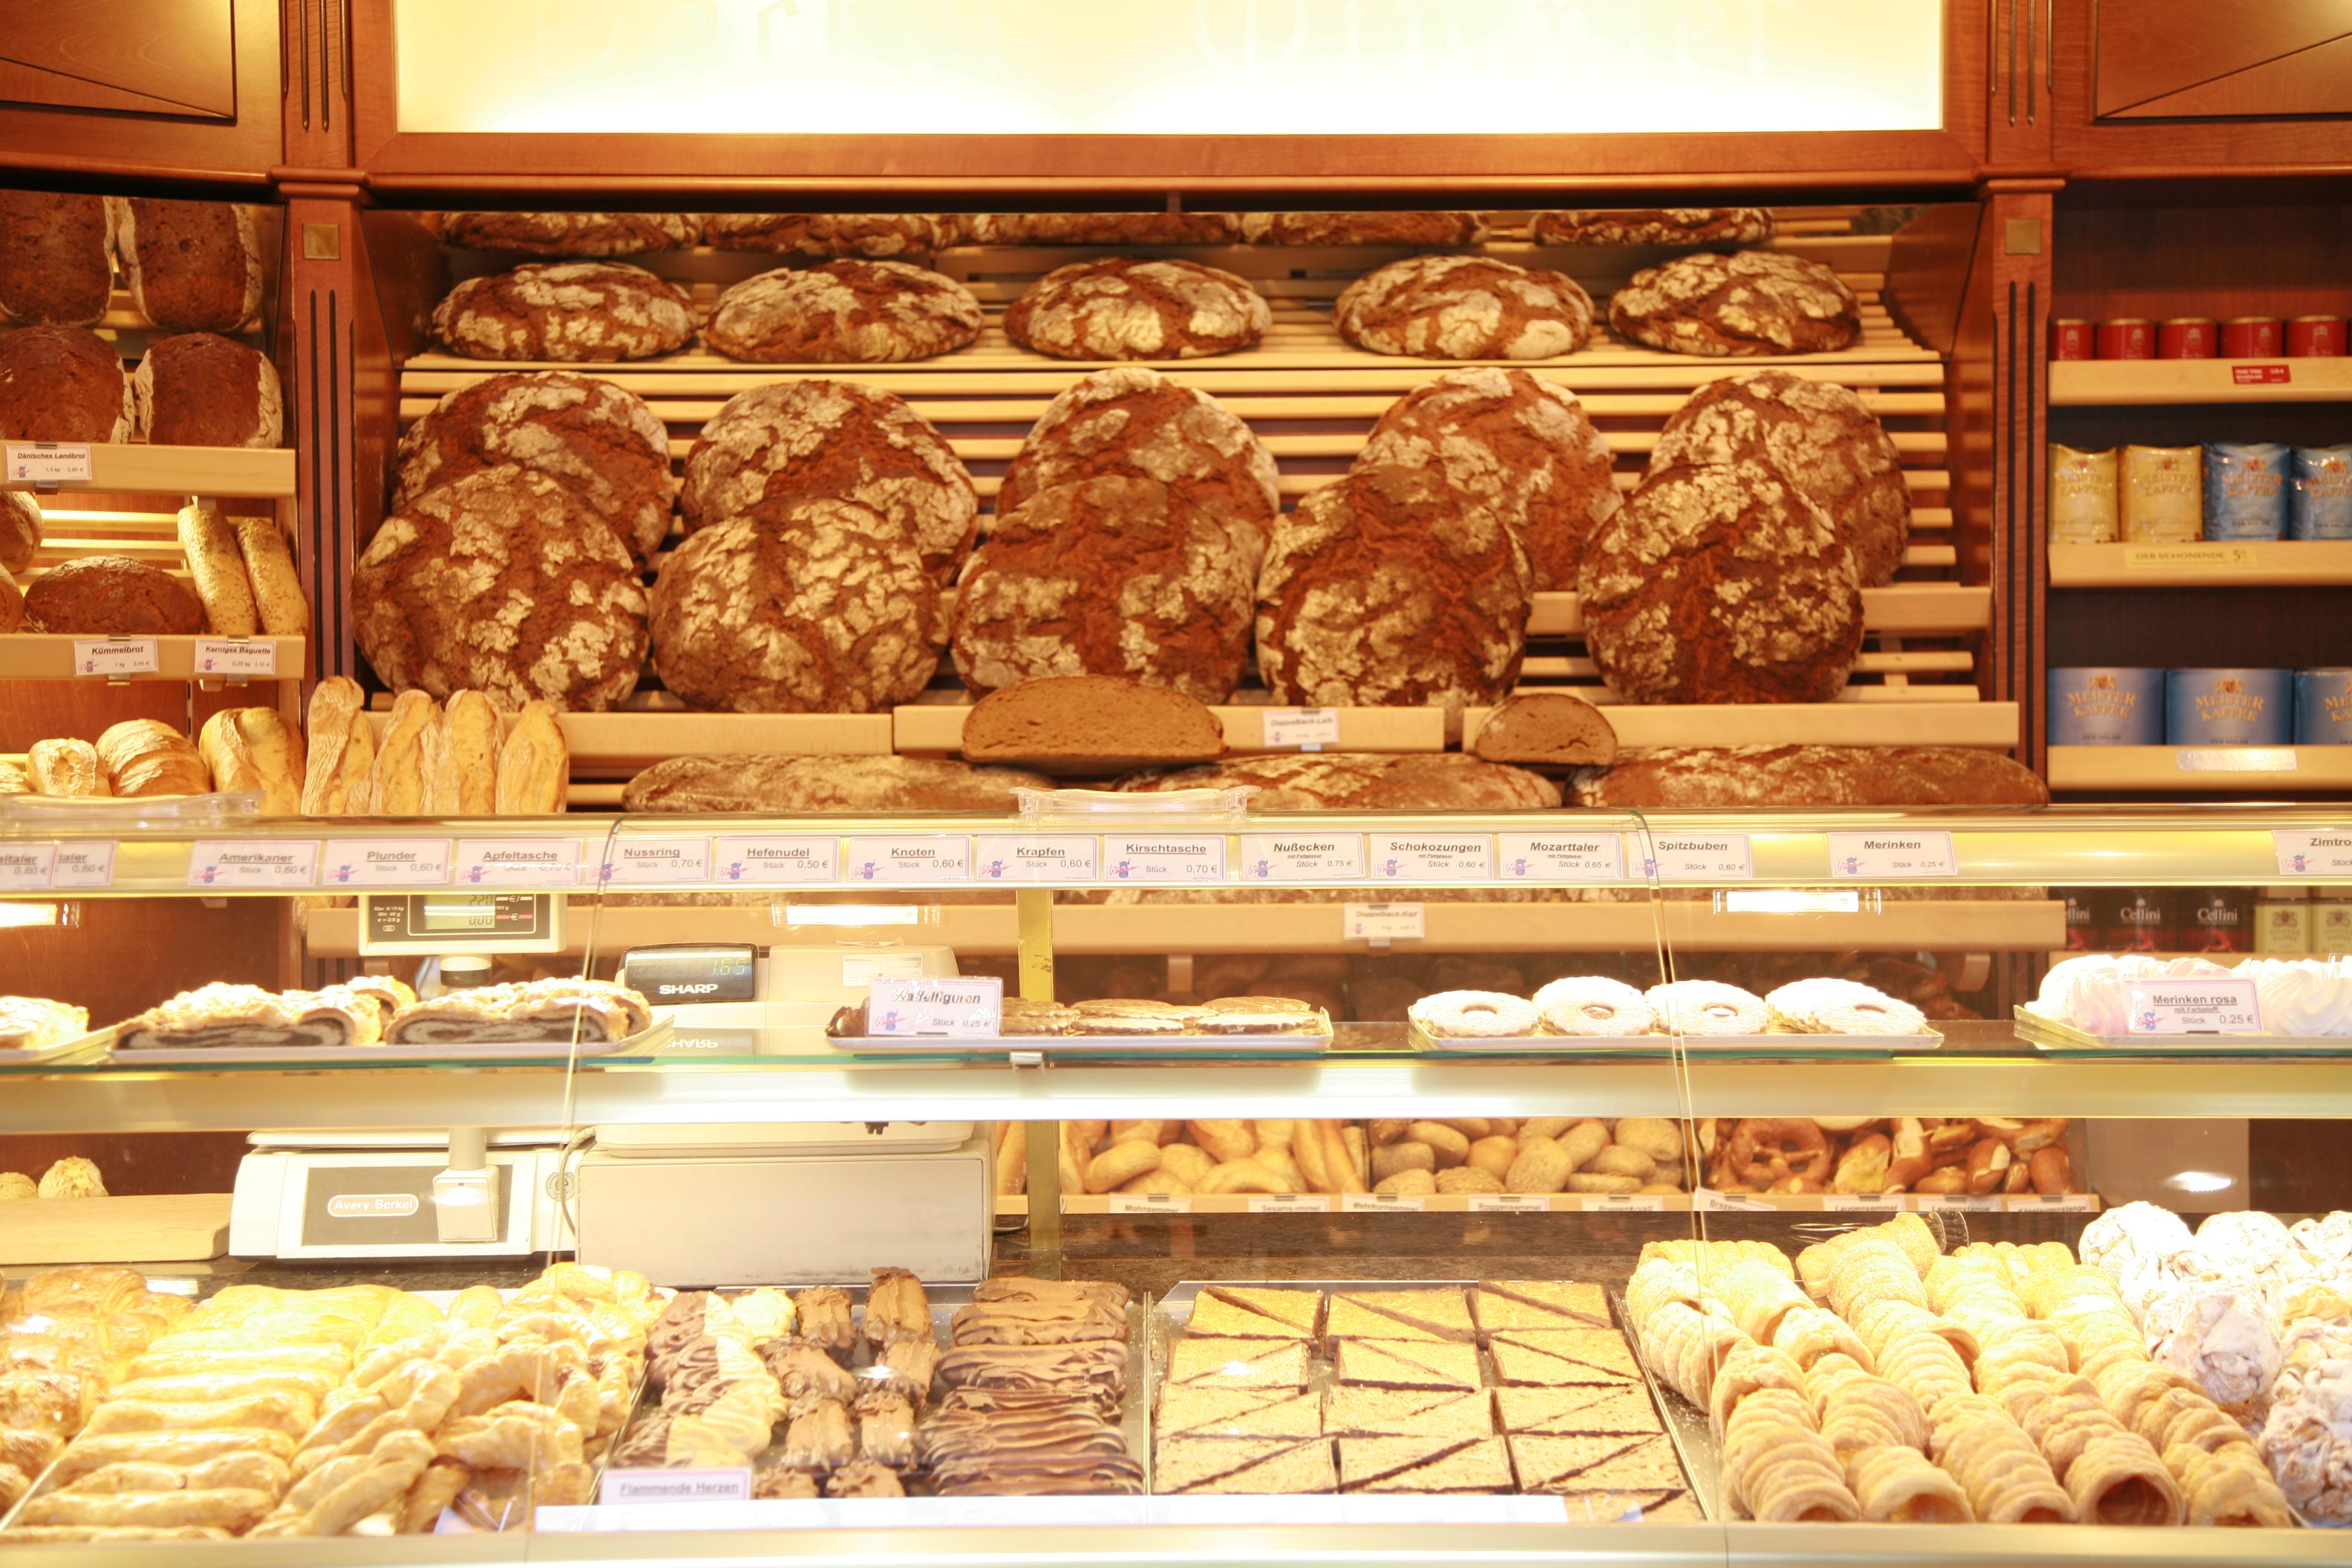 Bäcker Wimmer